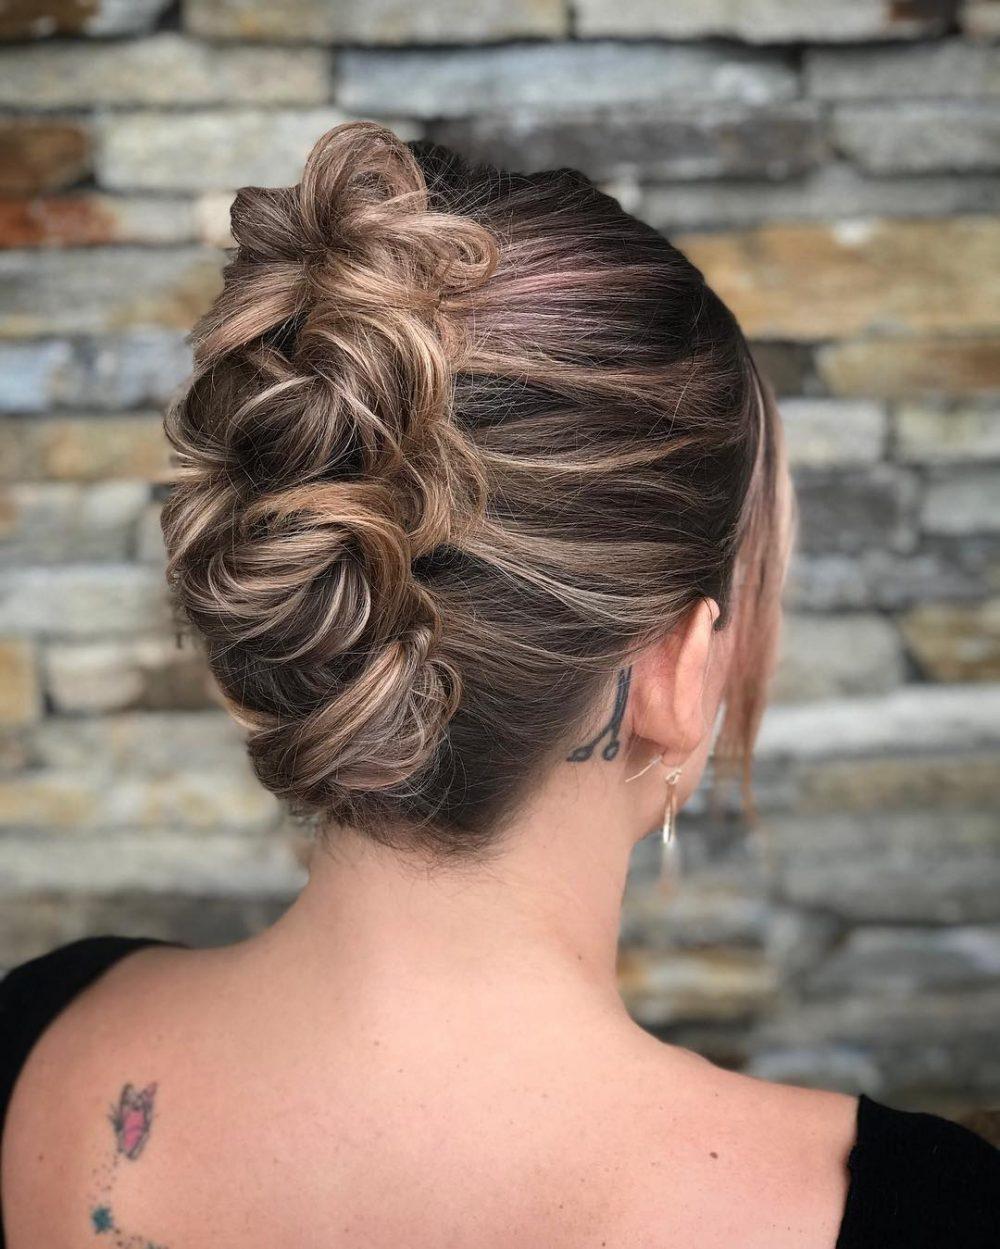 Elegantly Versatile Updo hairstyle